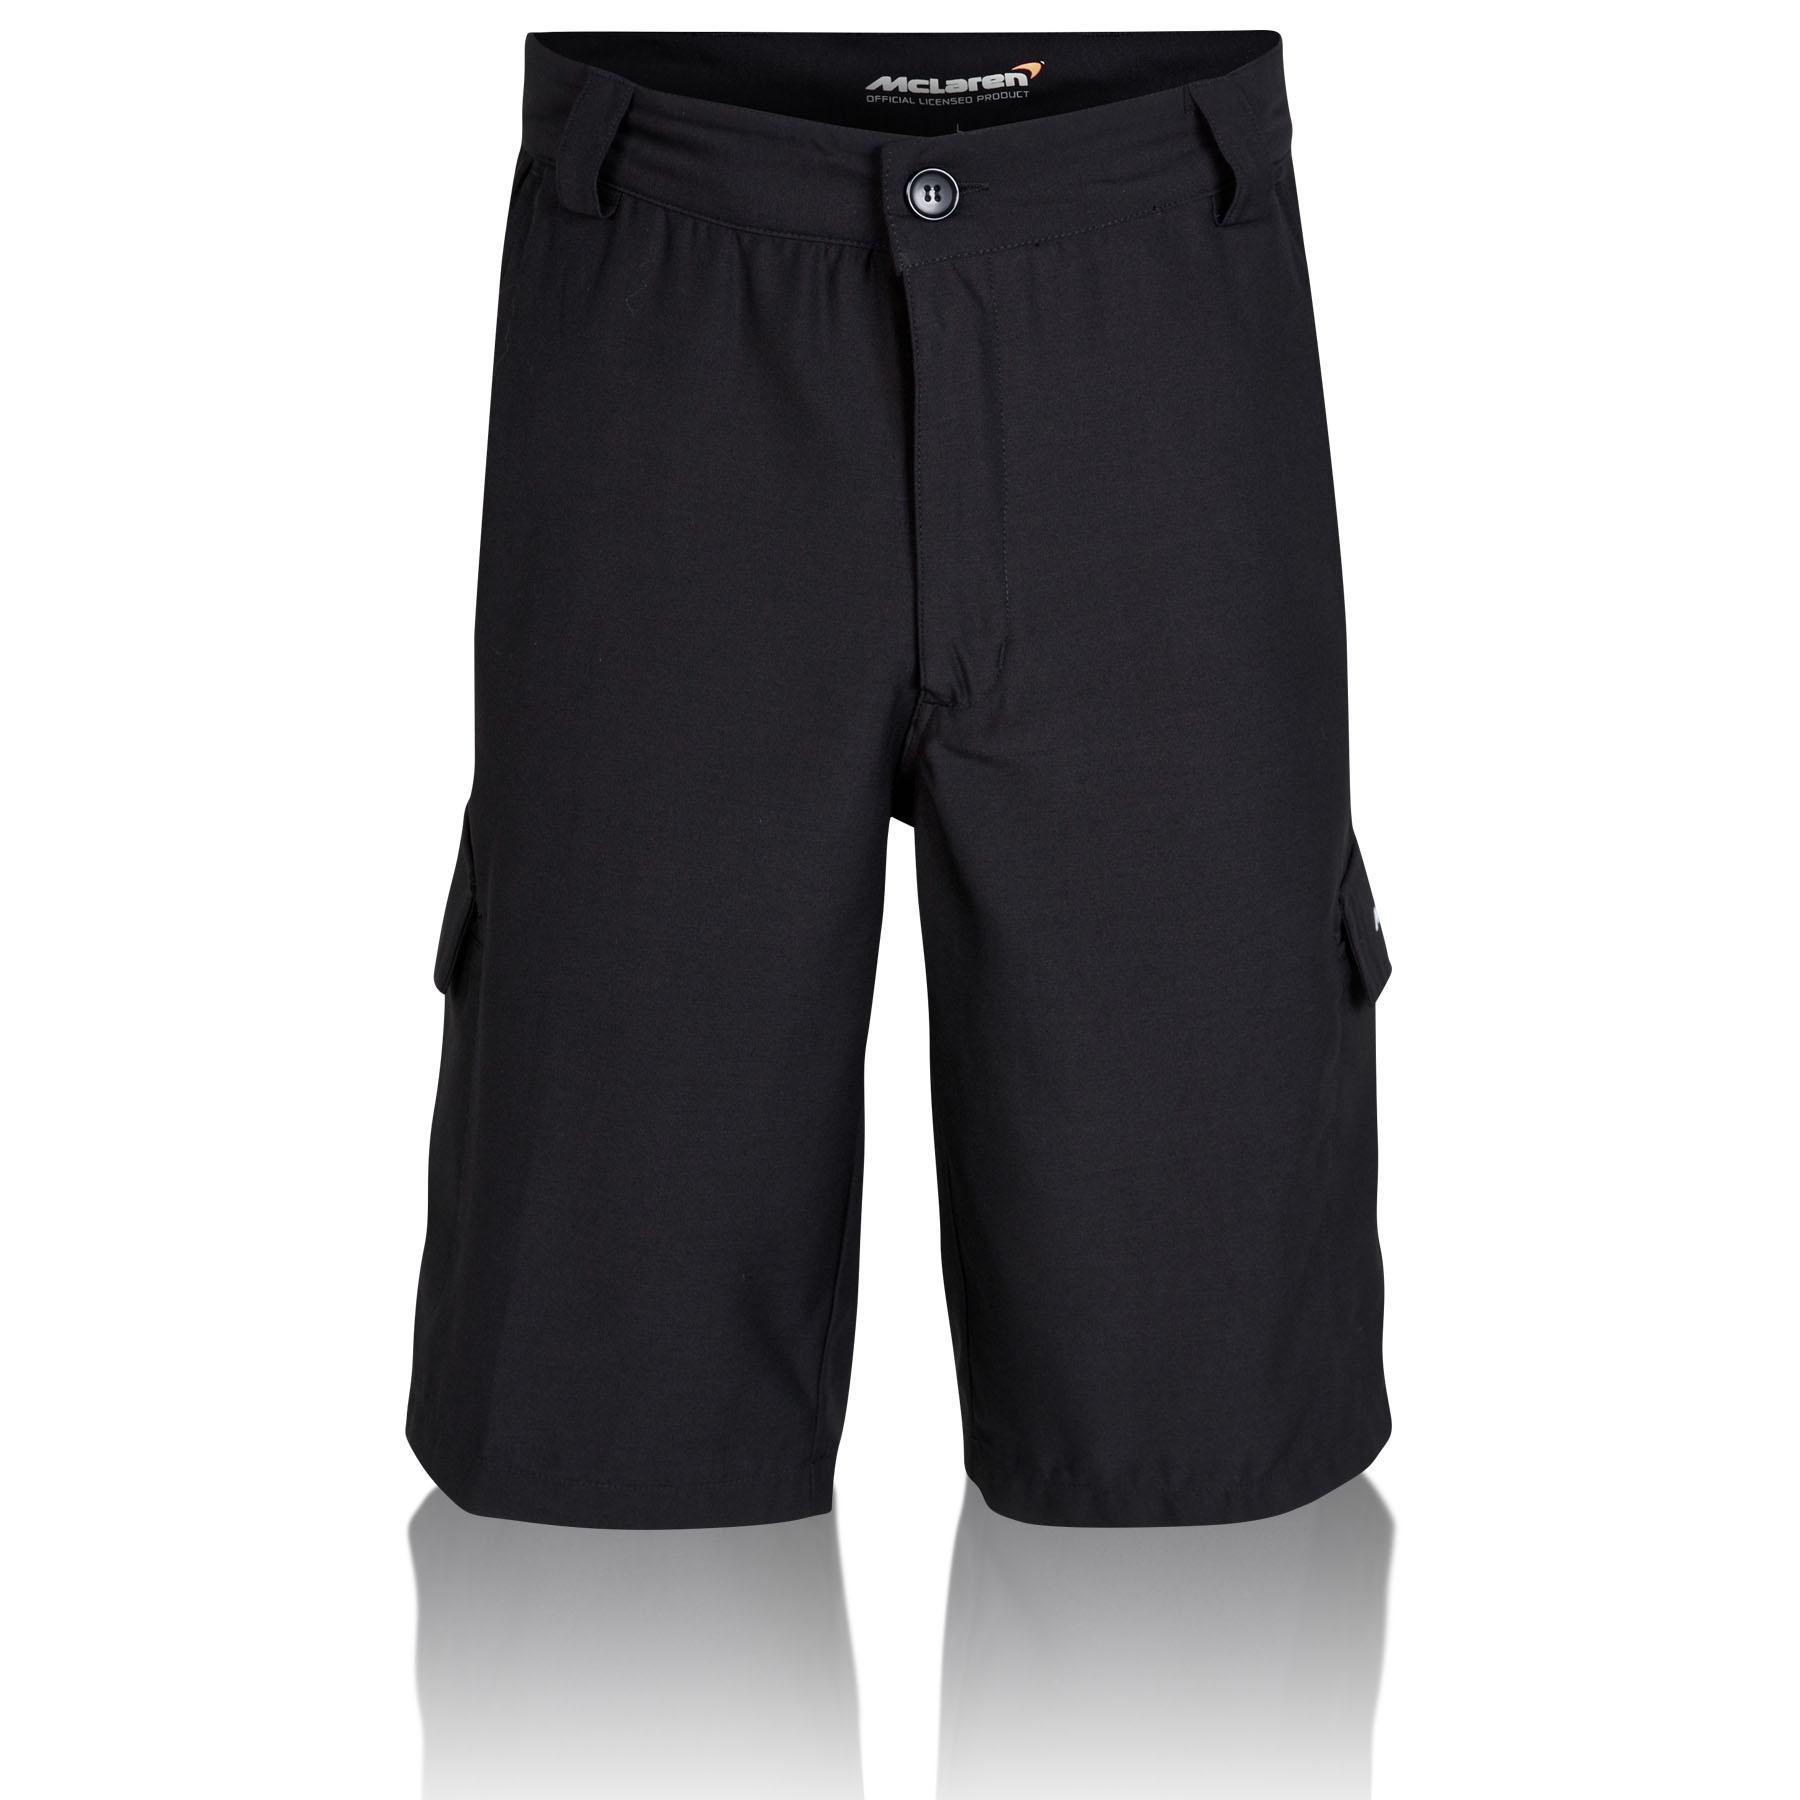 Team McLaren Team Shorts